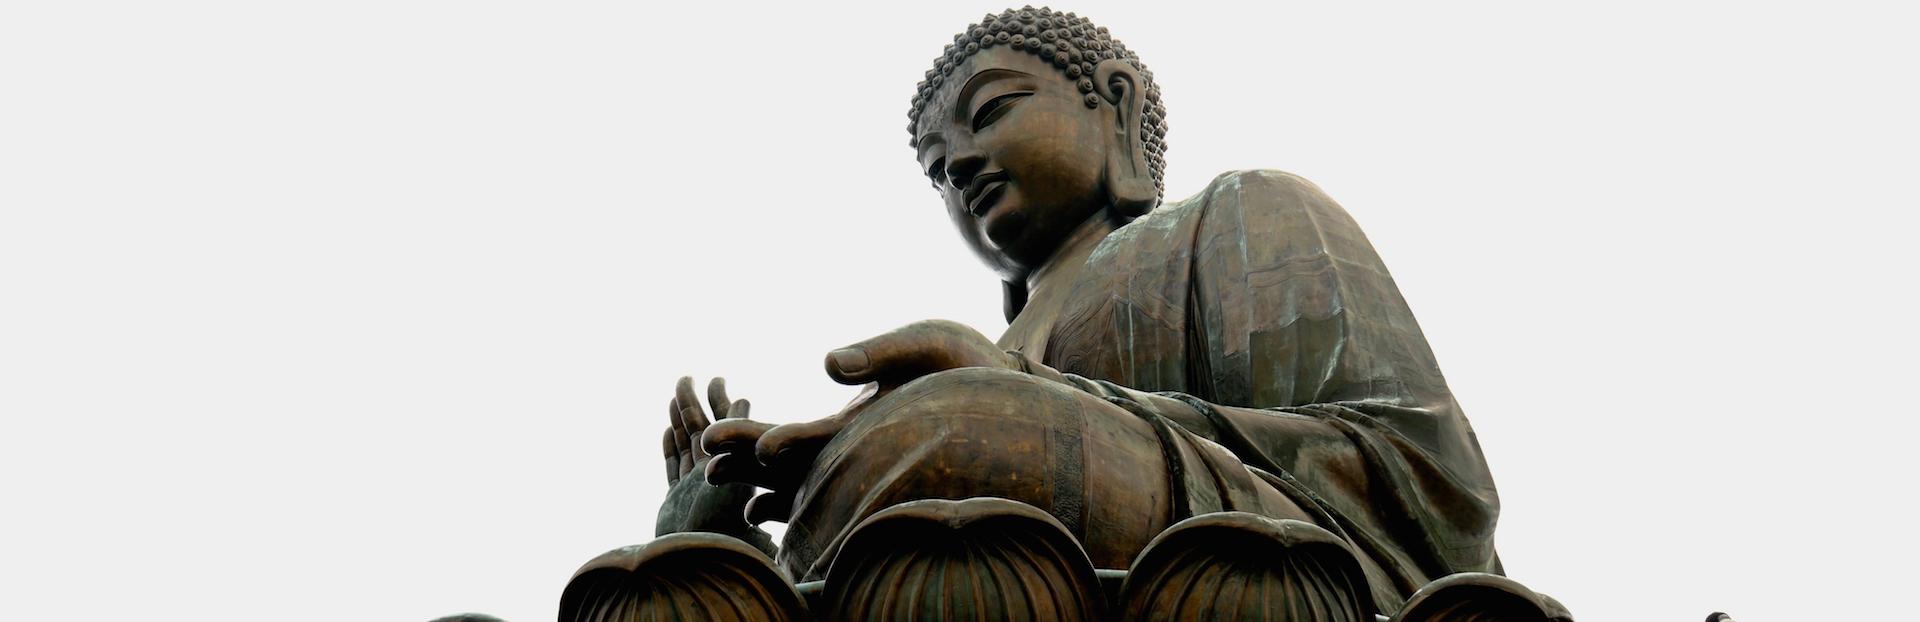 Hong Kong audio tour: Ngong Ping: Walking with Buddha